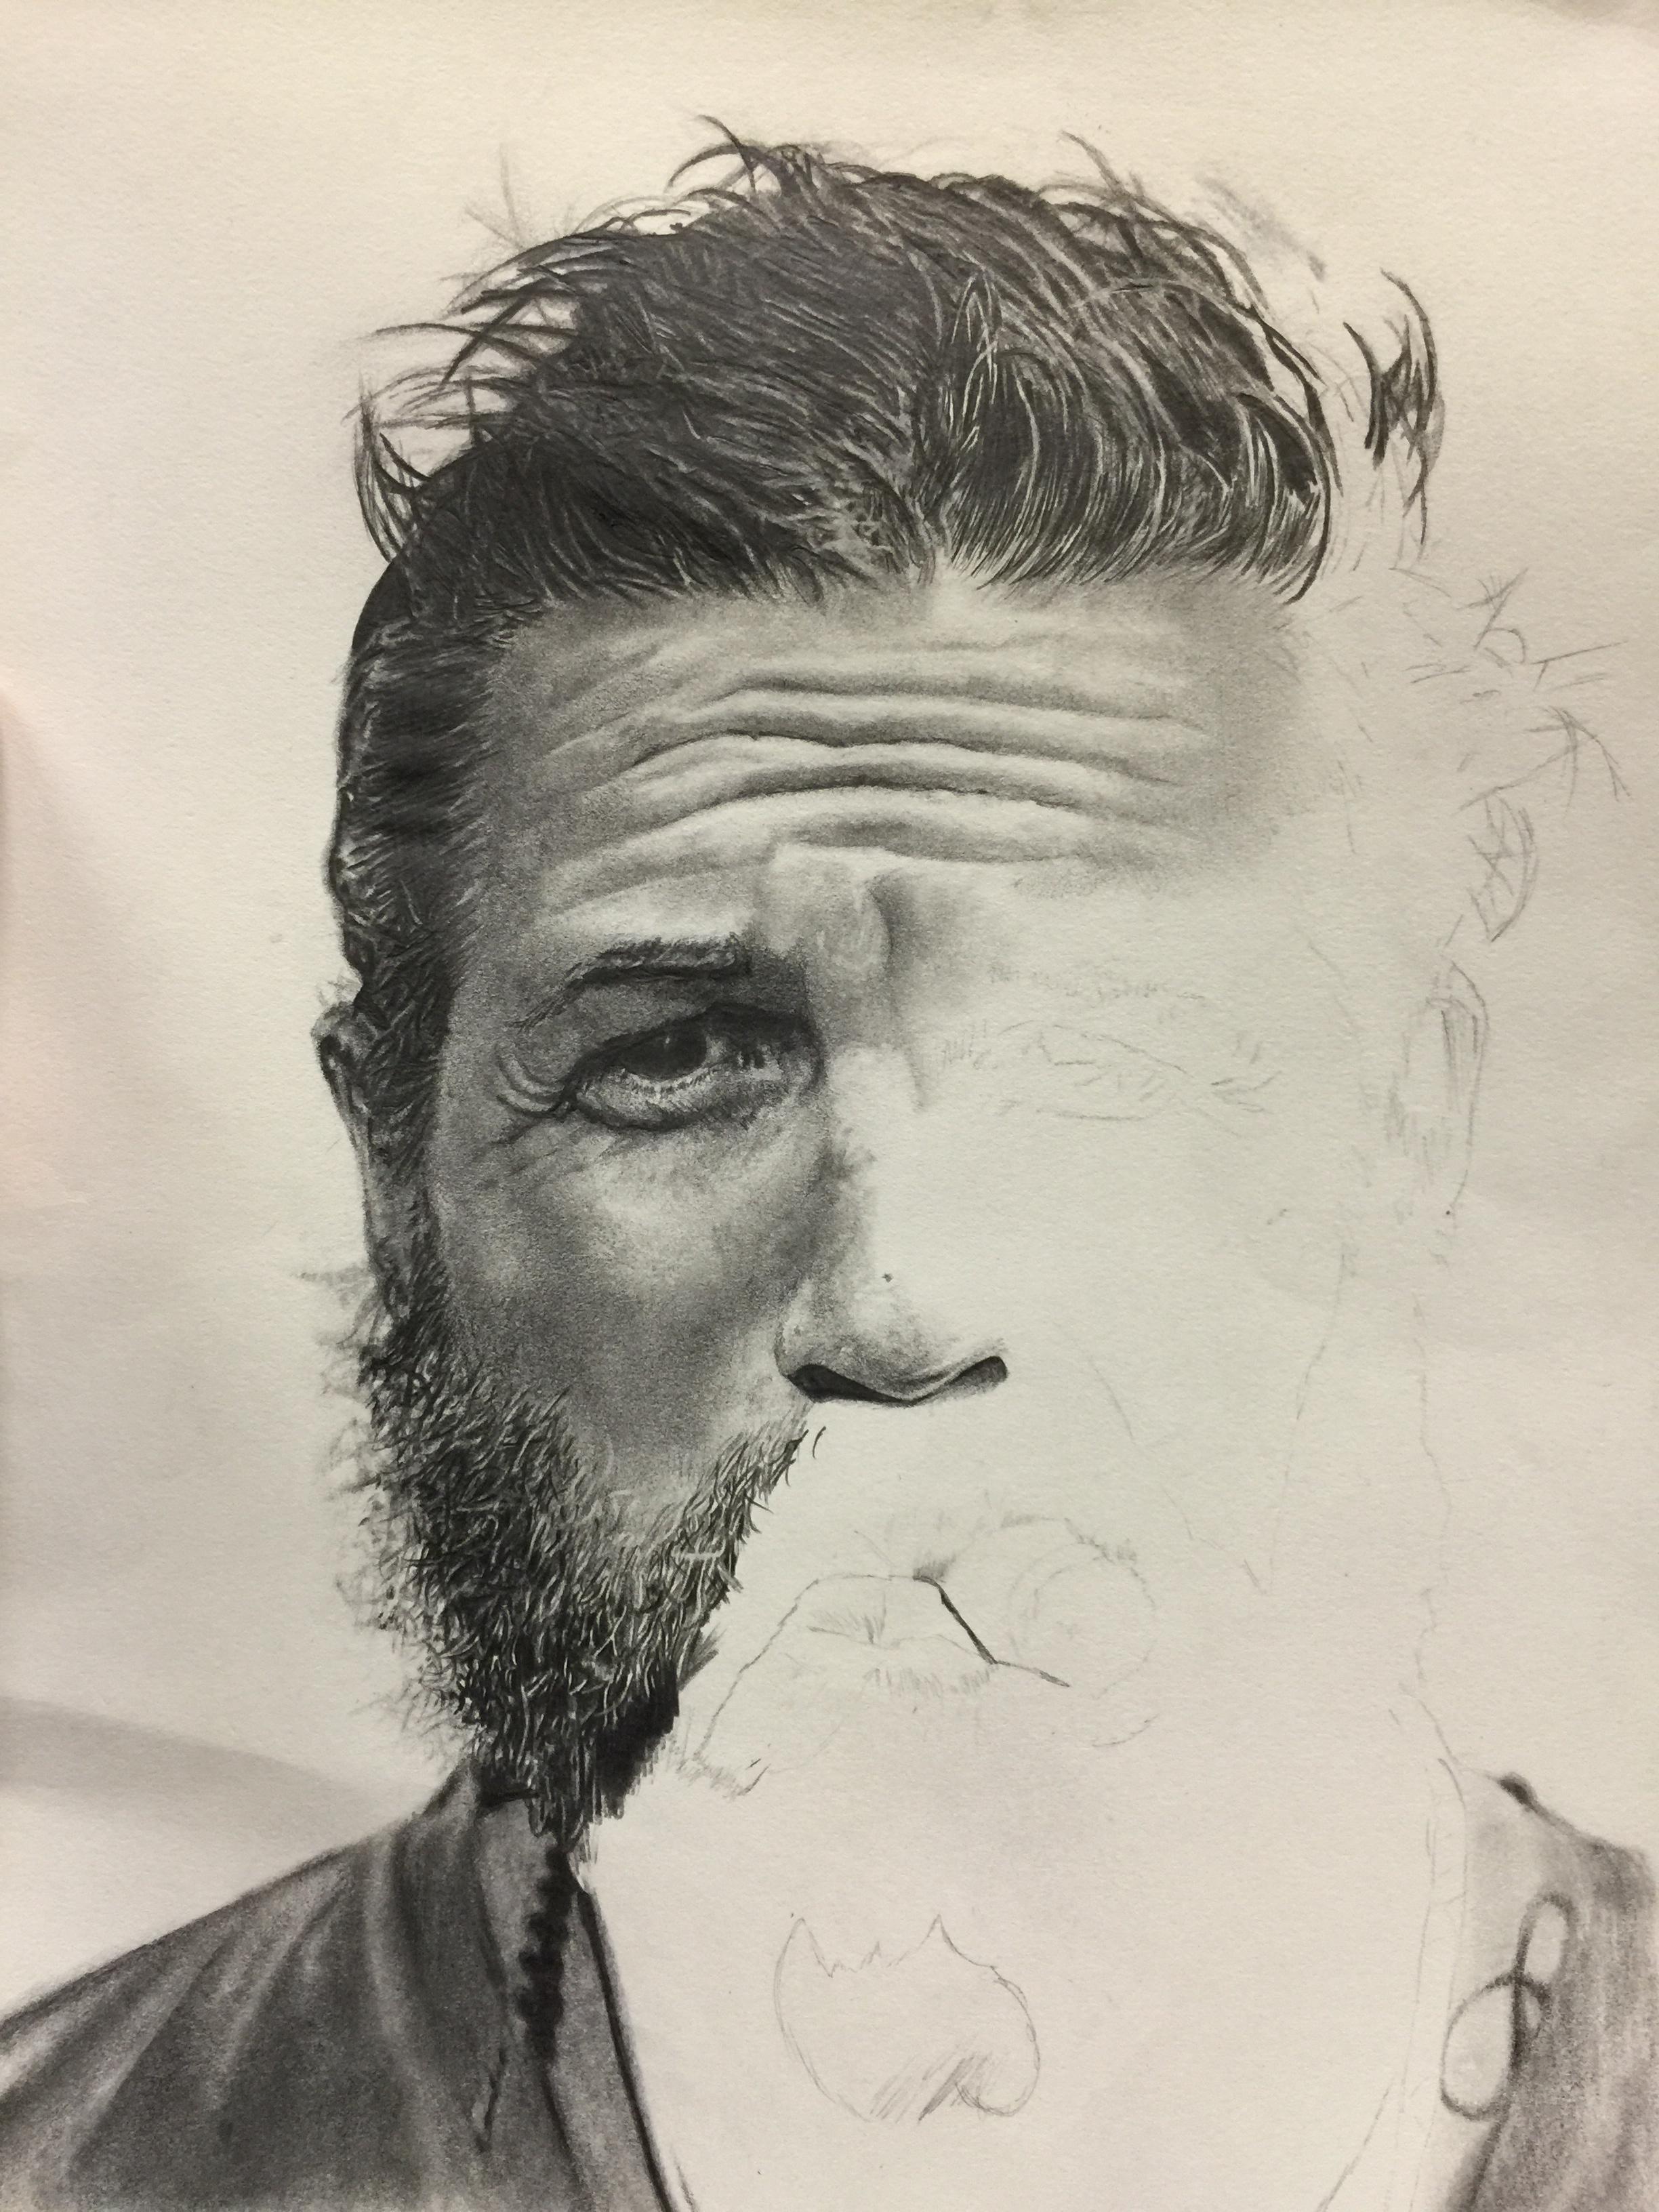 gom_hardy_cigar_drawing_progression_a_rajzolas_folyamata_szivarozas_3.jpg